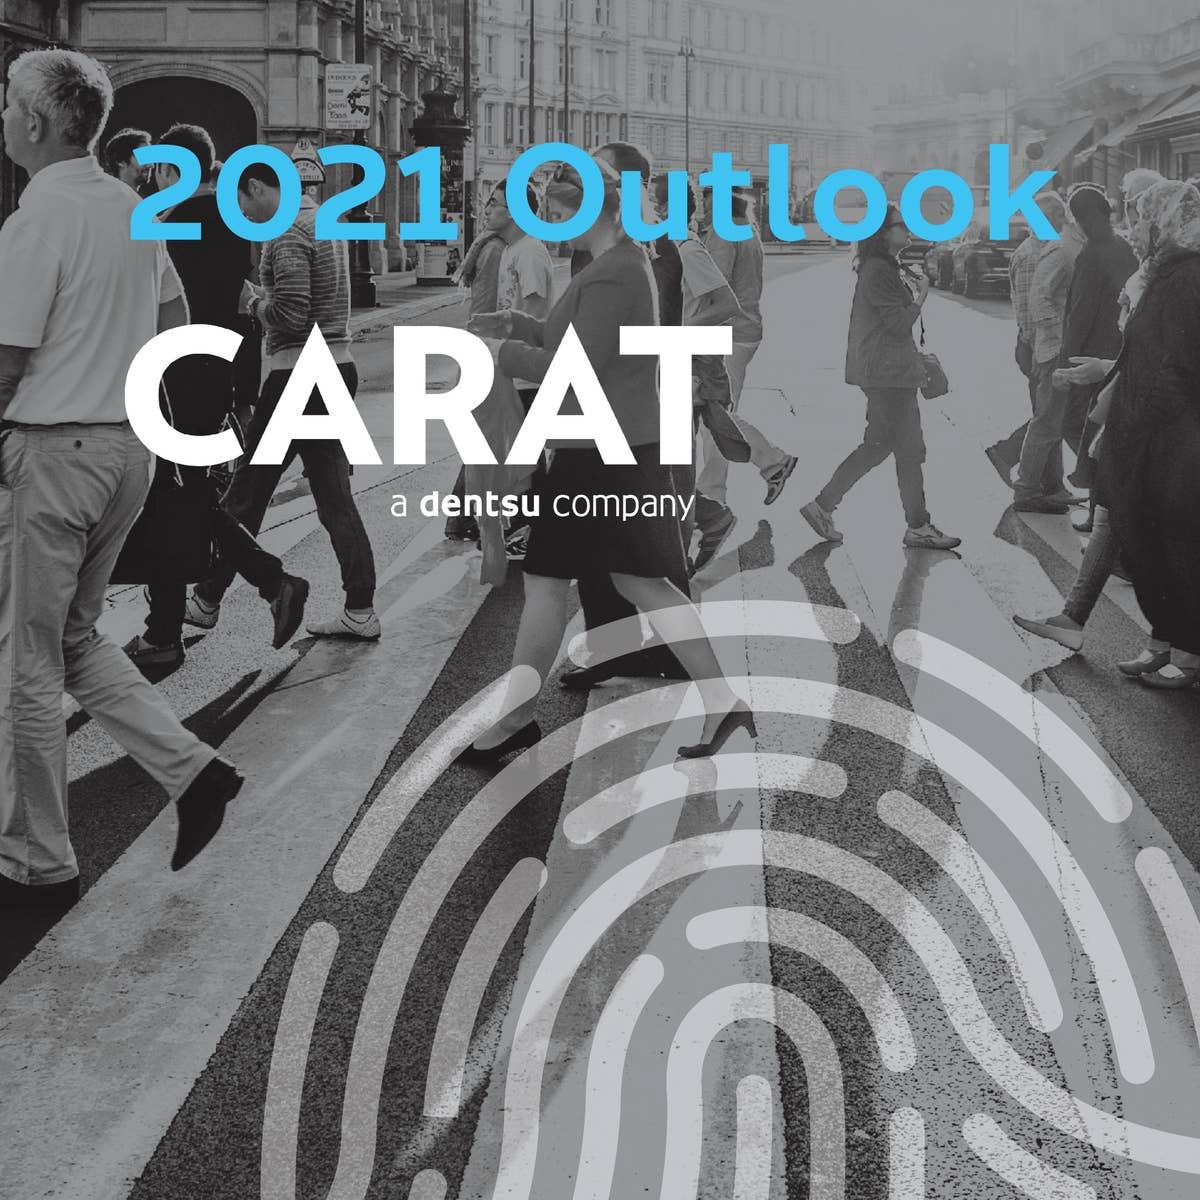 Carat Ireland 2021 Outlook